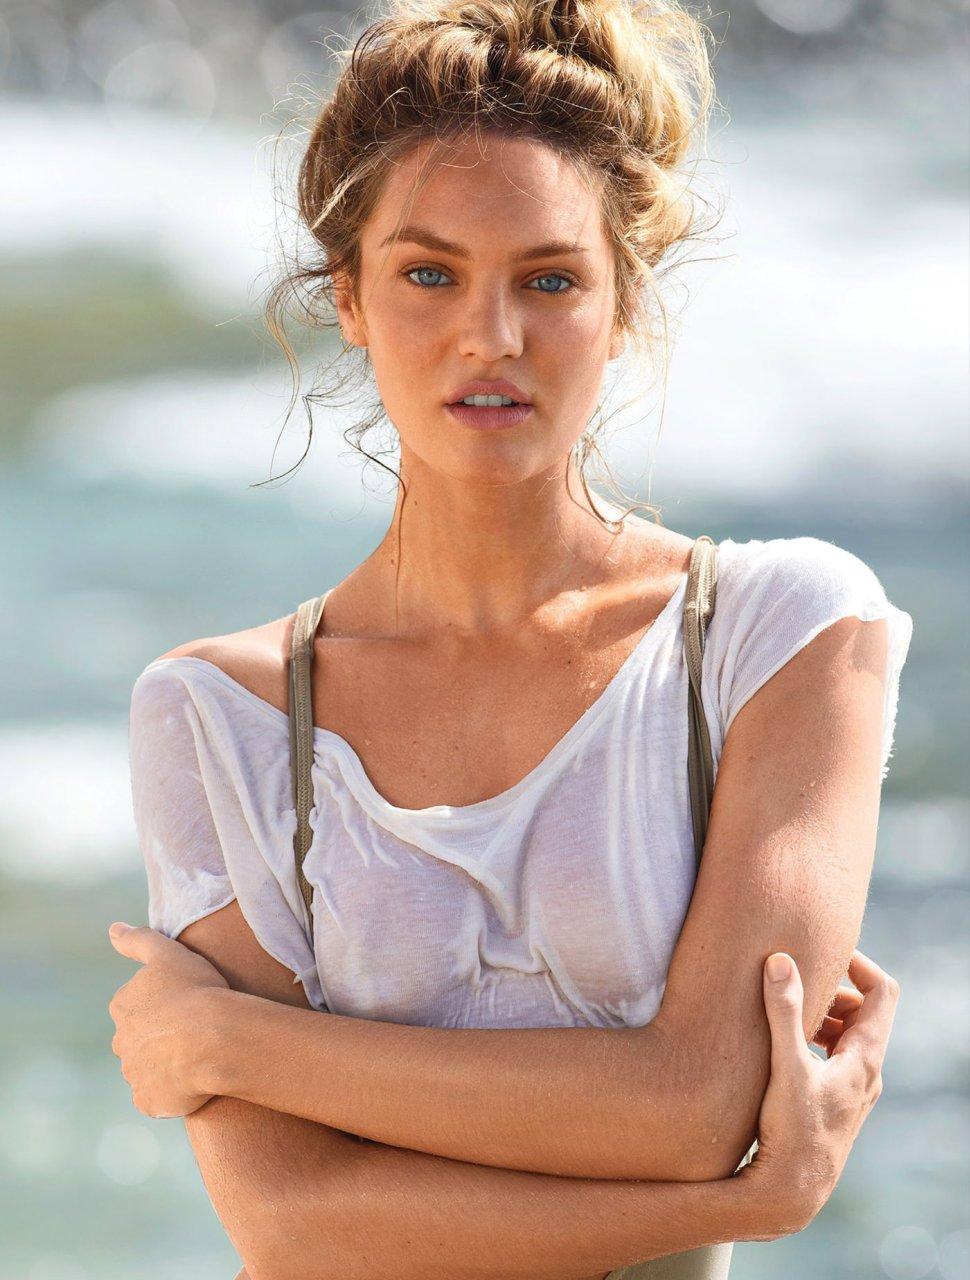 Daniela ruah maxim. 41 Hot Pictures of Daniela Ruah From